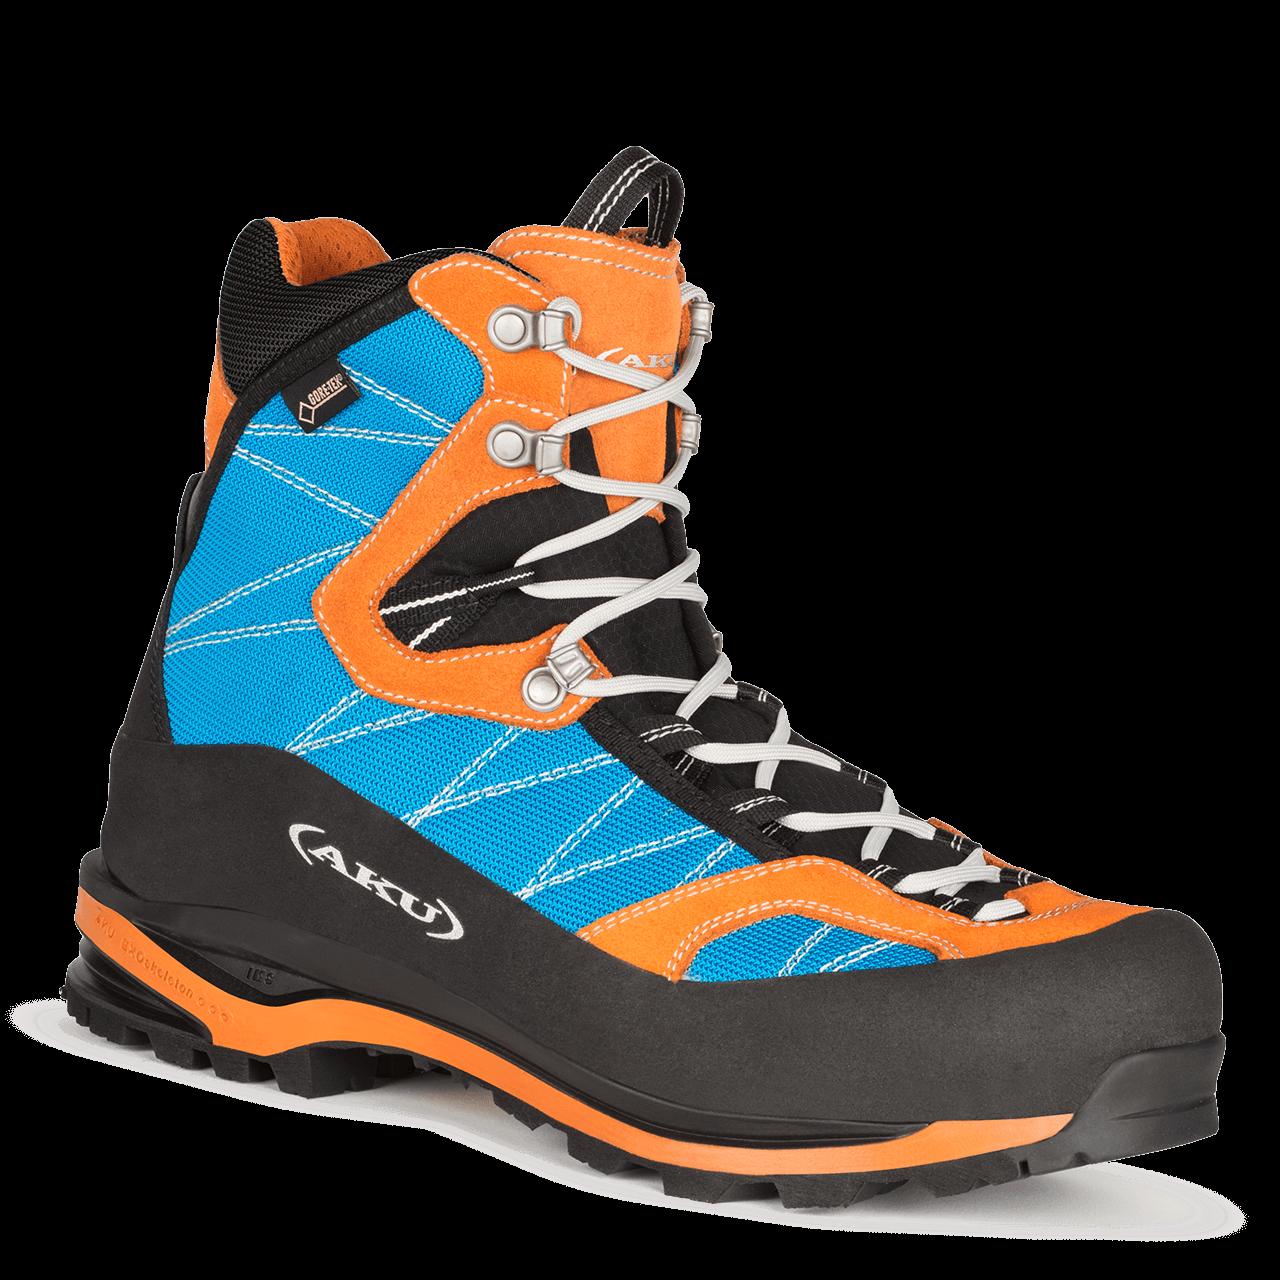 Aku Tengu GTX Calzatura Trekking | Scarponi trekking